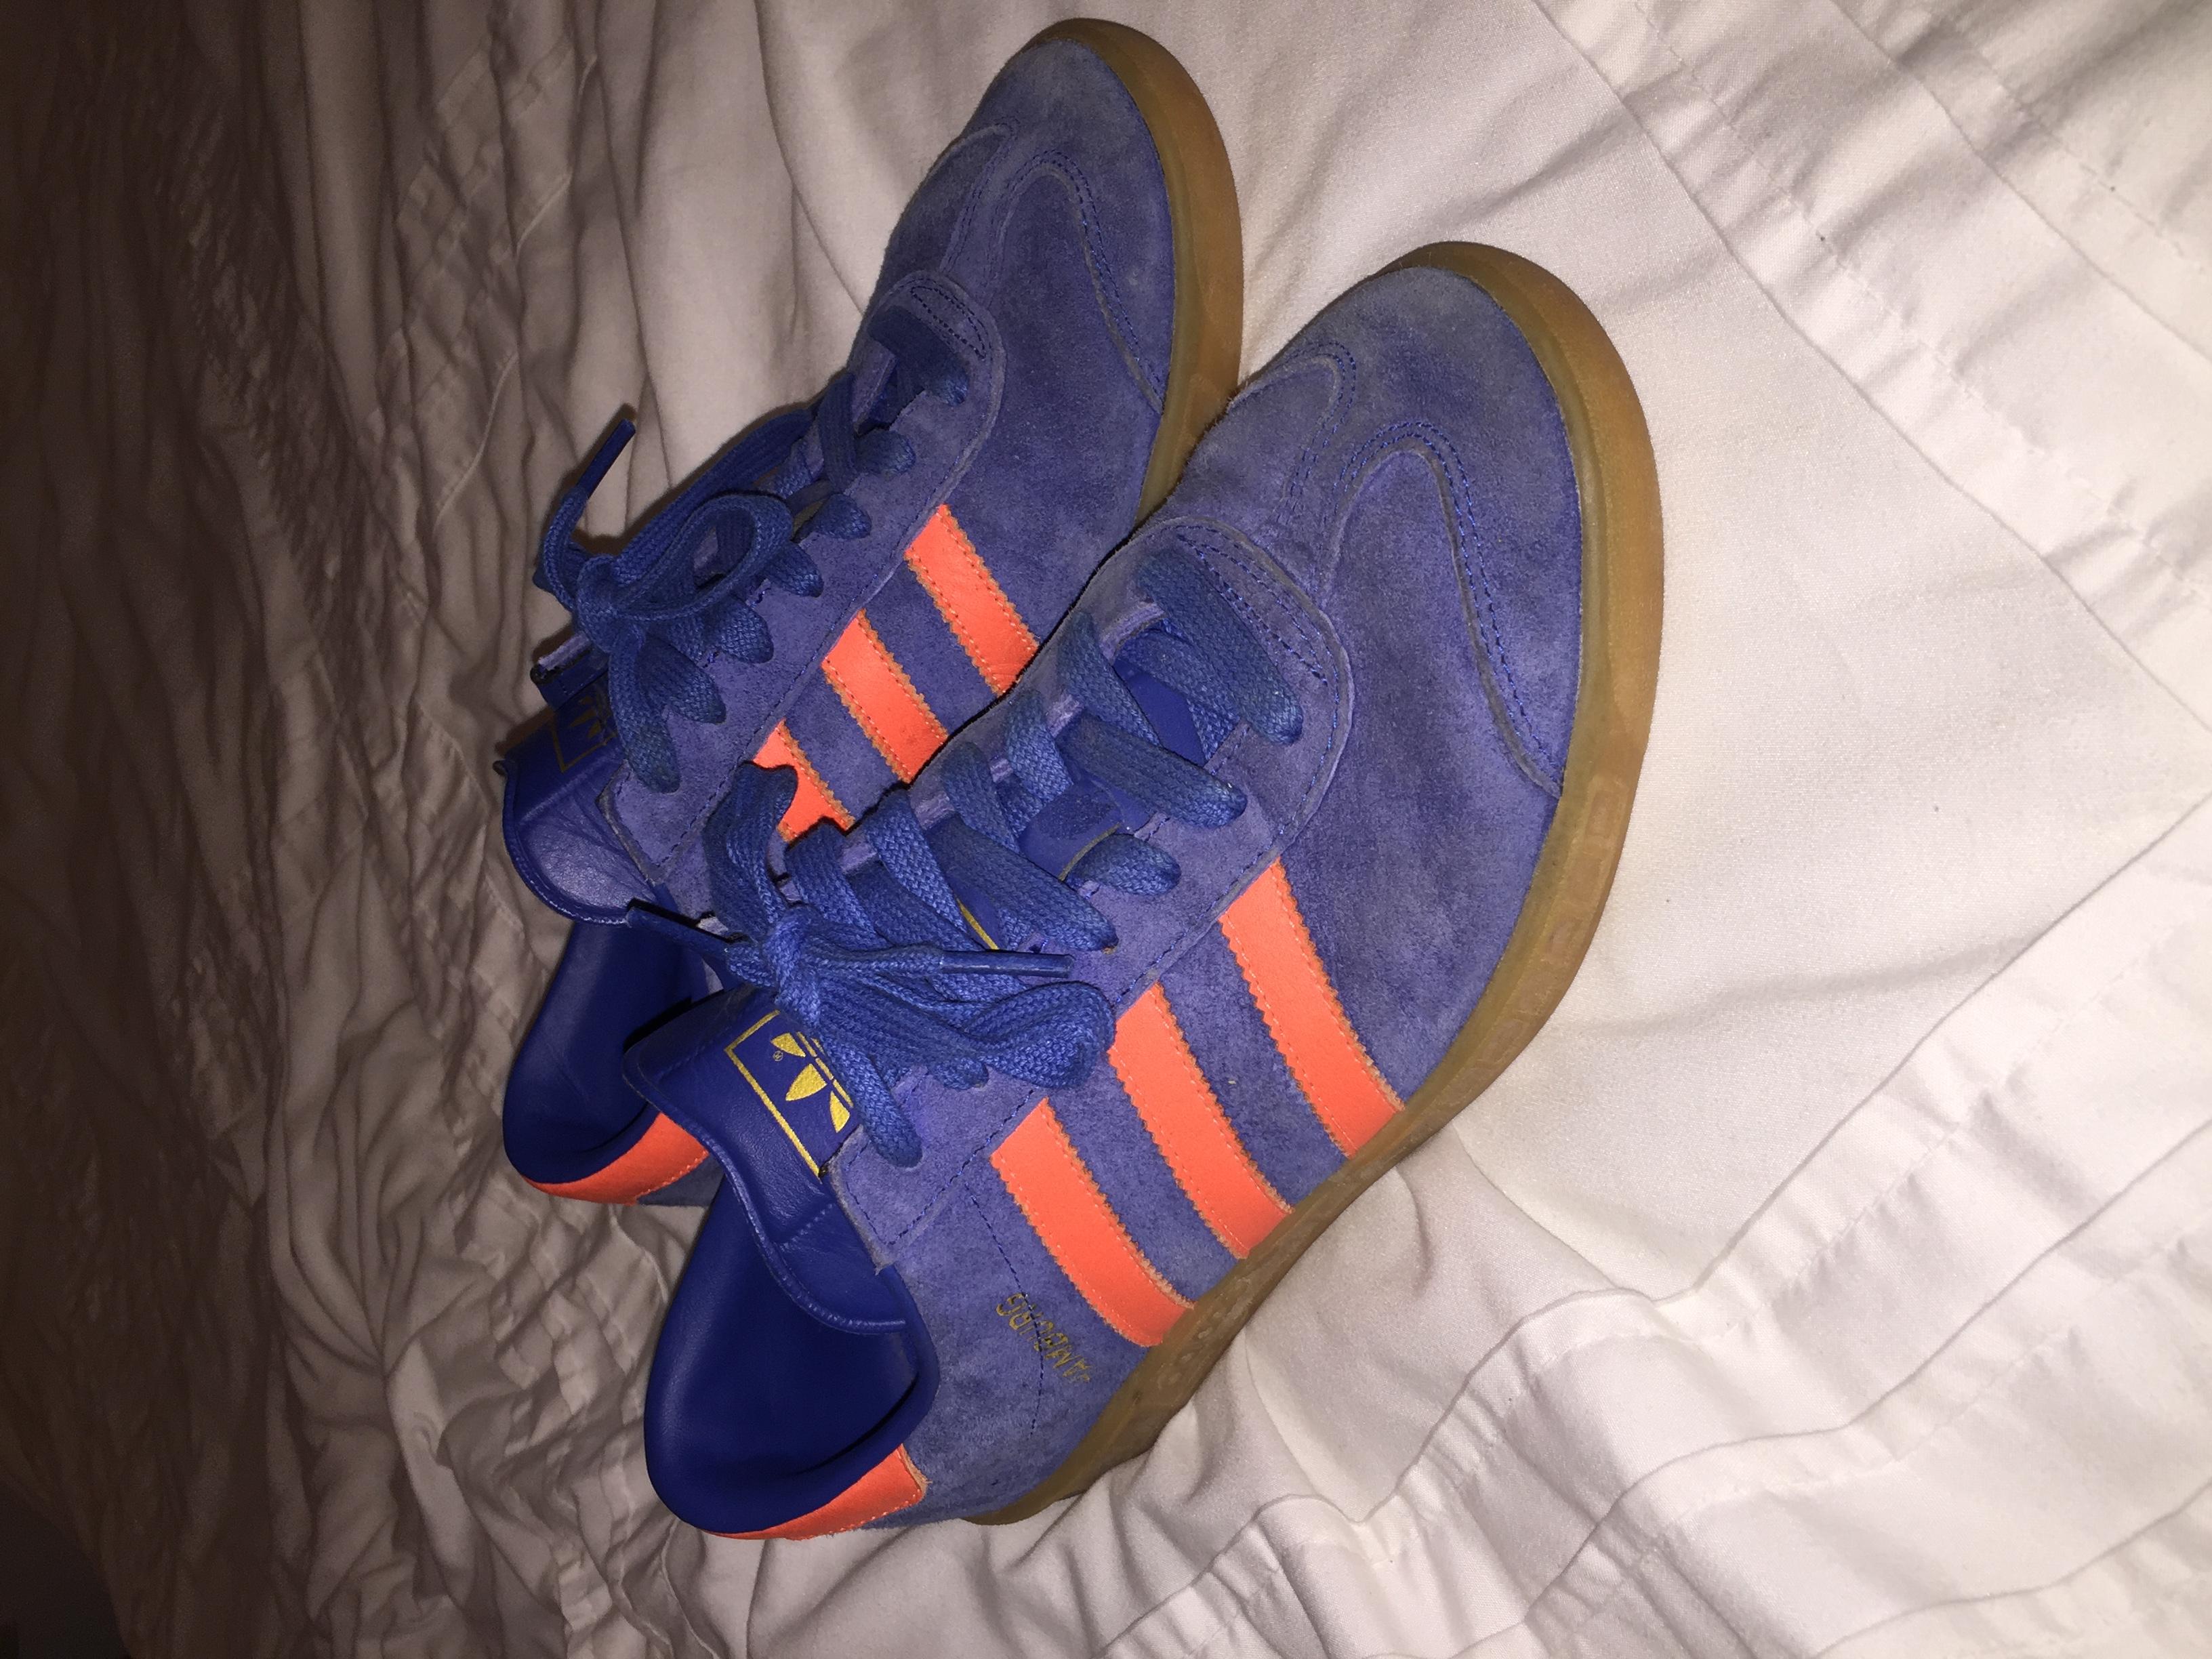 Adidas Adidas Hamburg (DUBLIN) Blue/Orange (7.5)